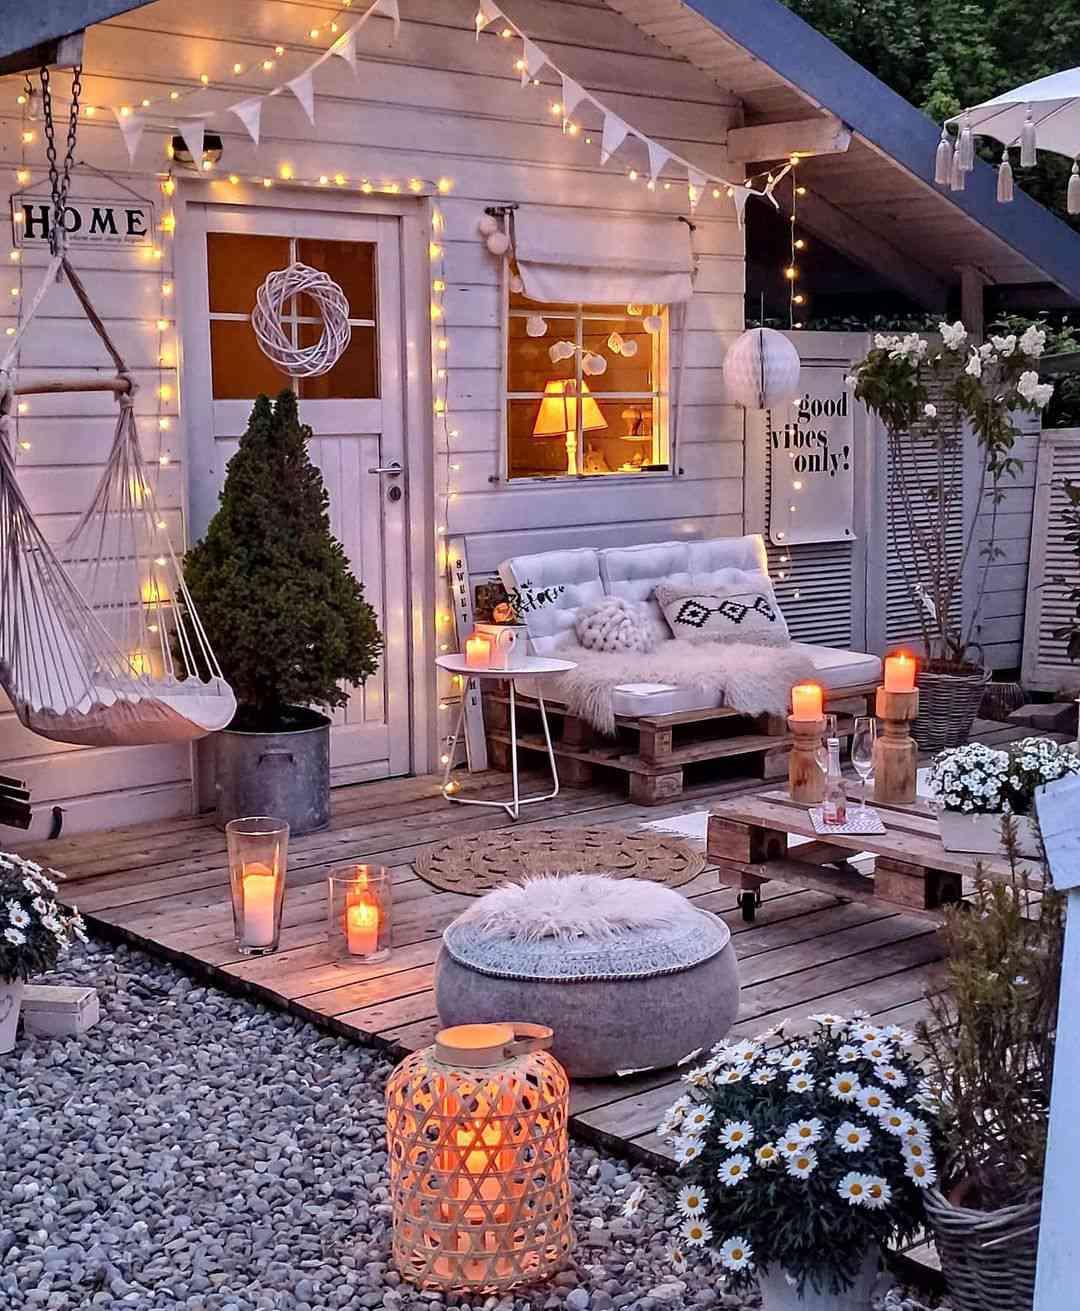 outdoor party idea nighttime